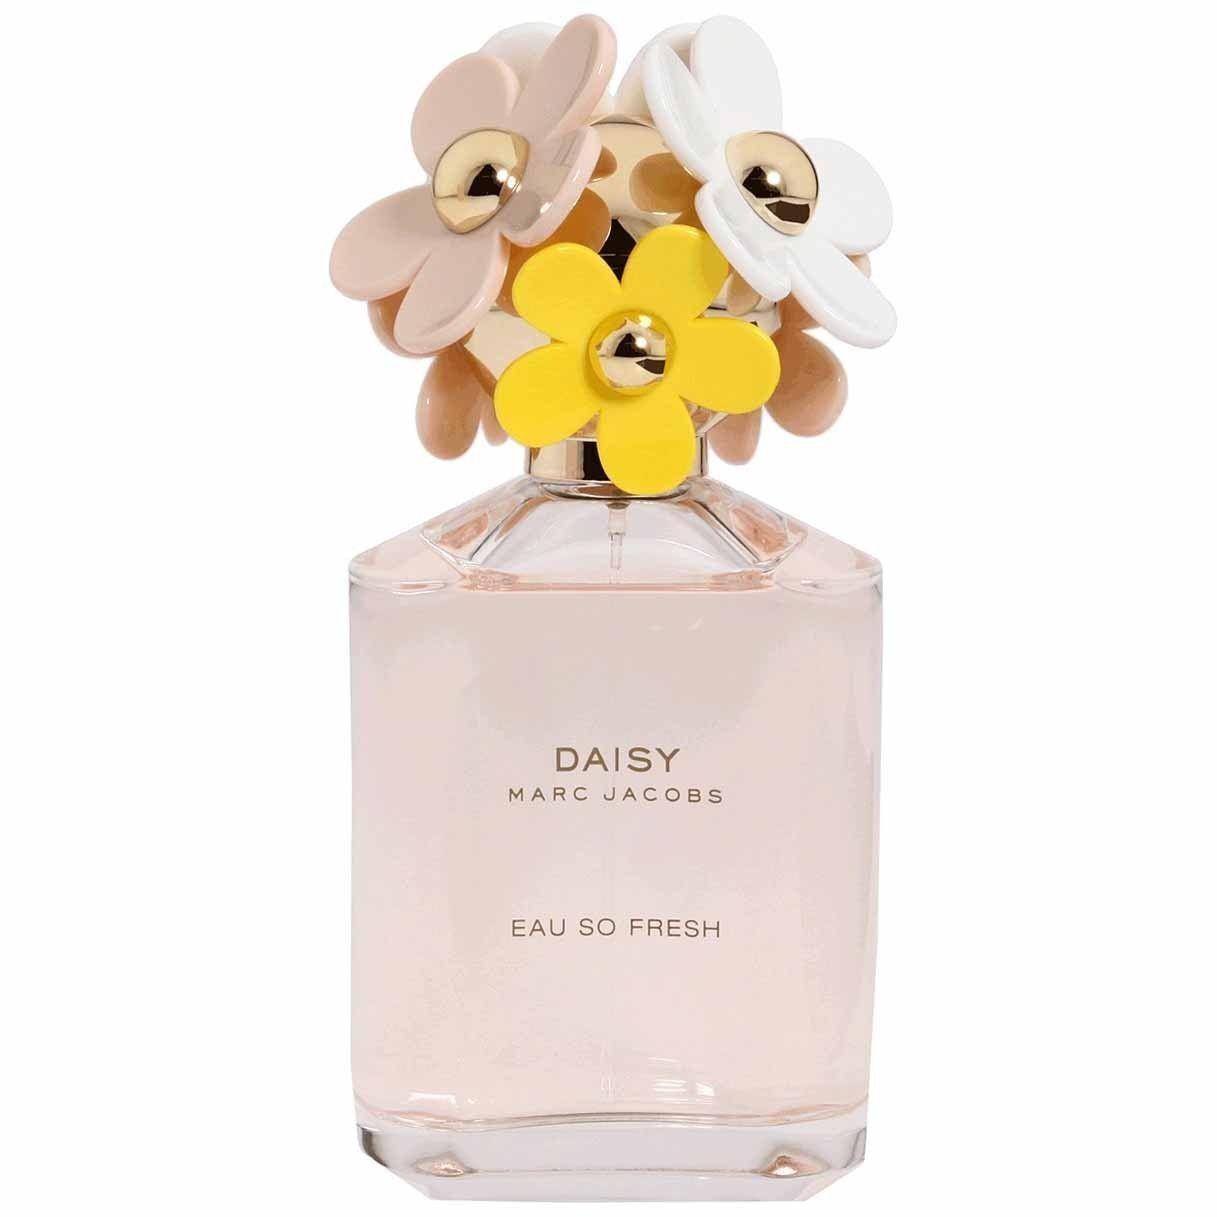 Marc jacobs daisy eau so fresh perfume 425 oz edt spray ebay resntentobalflowflowcomponenttechnicalissues izmirmasajfo